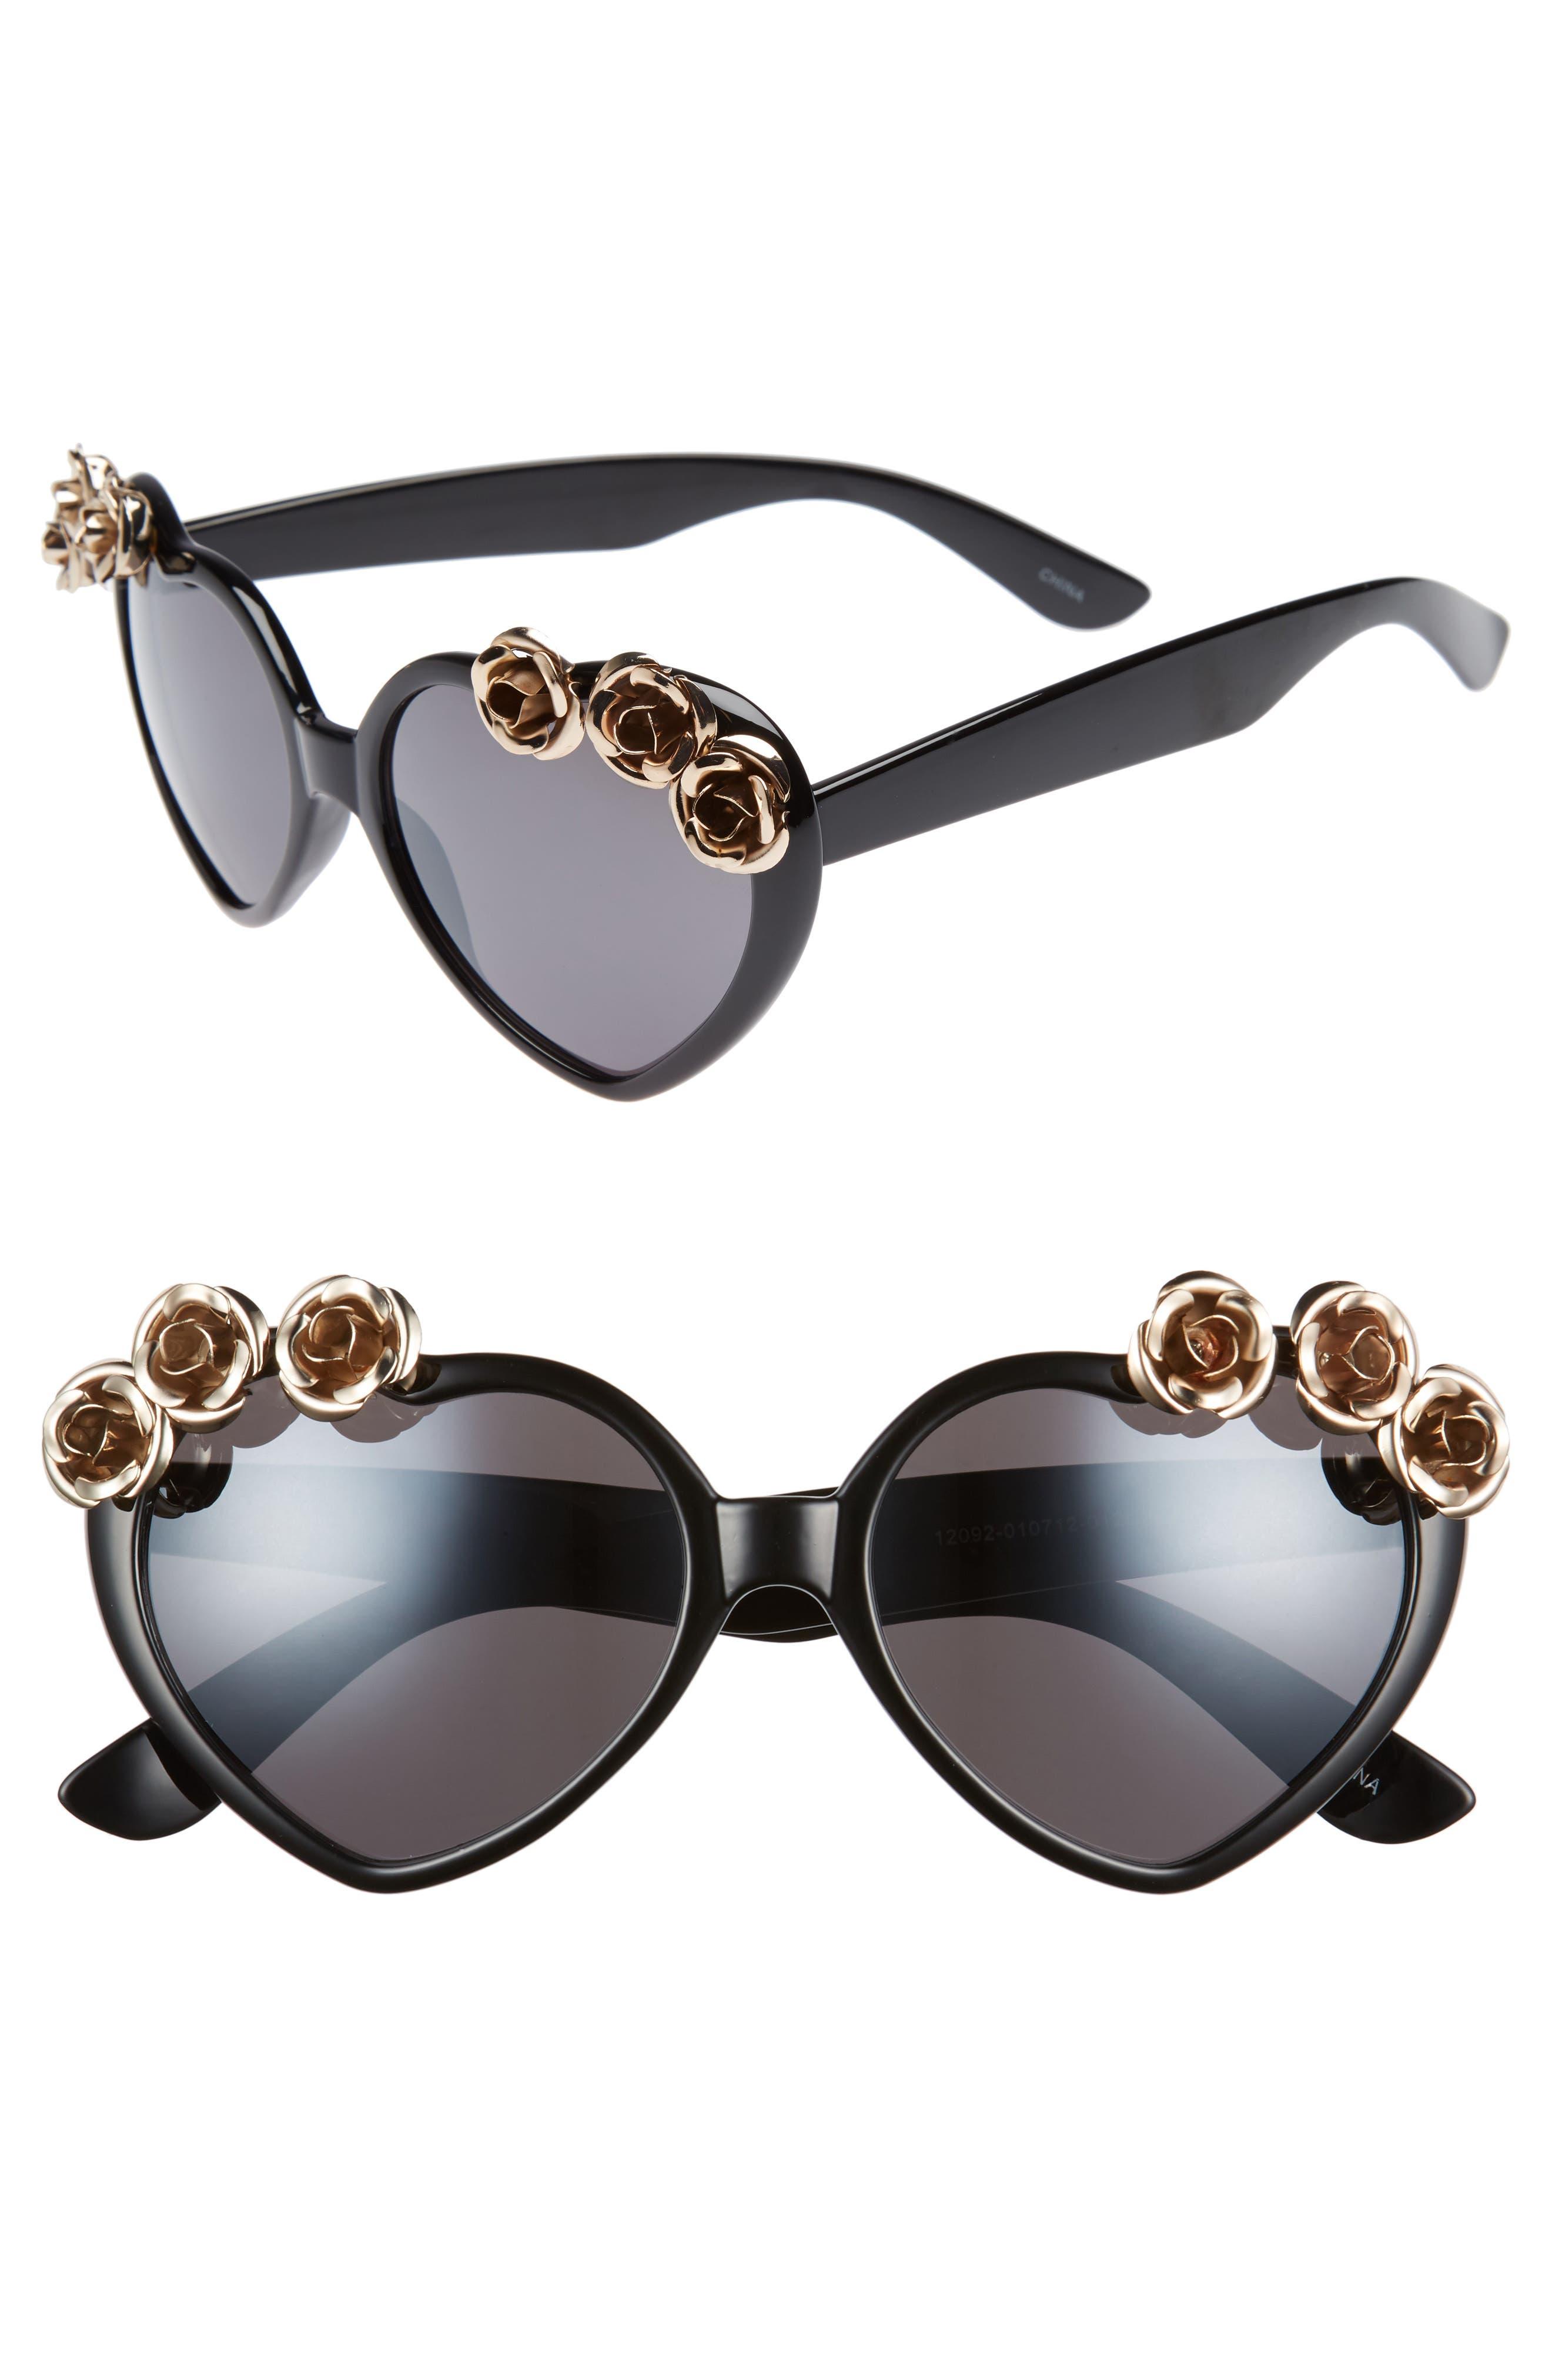 Main Image - Leith 58mm Rose Embellished Heart Sunglasses